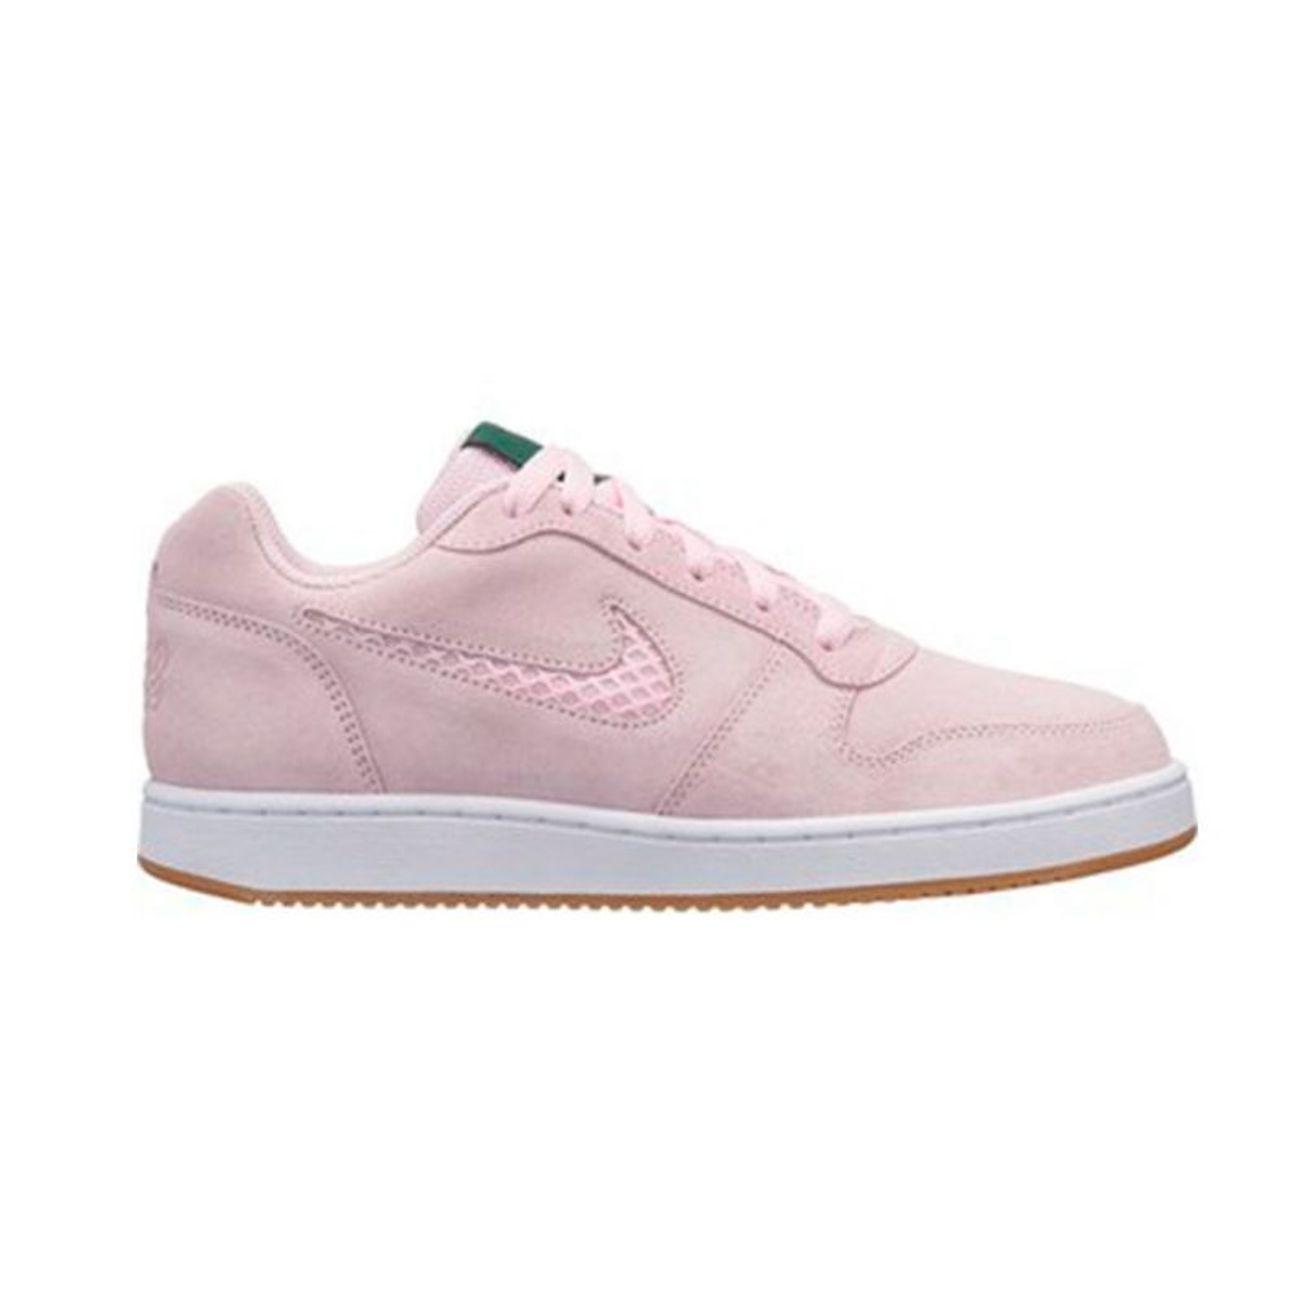 Premium Padel 600 Low Niaq2232 Adulte Ebernon Nike Rosa Mujer OXuPkZiT